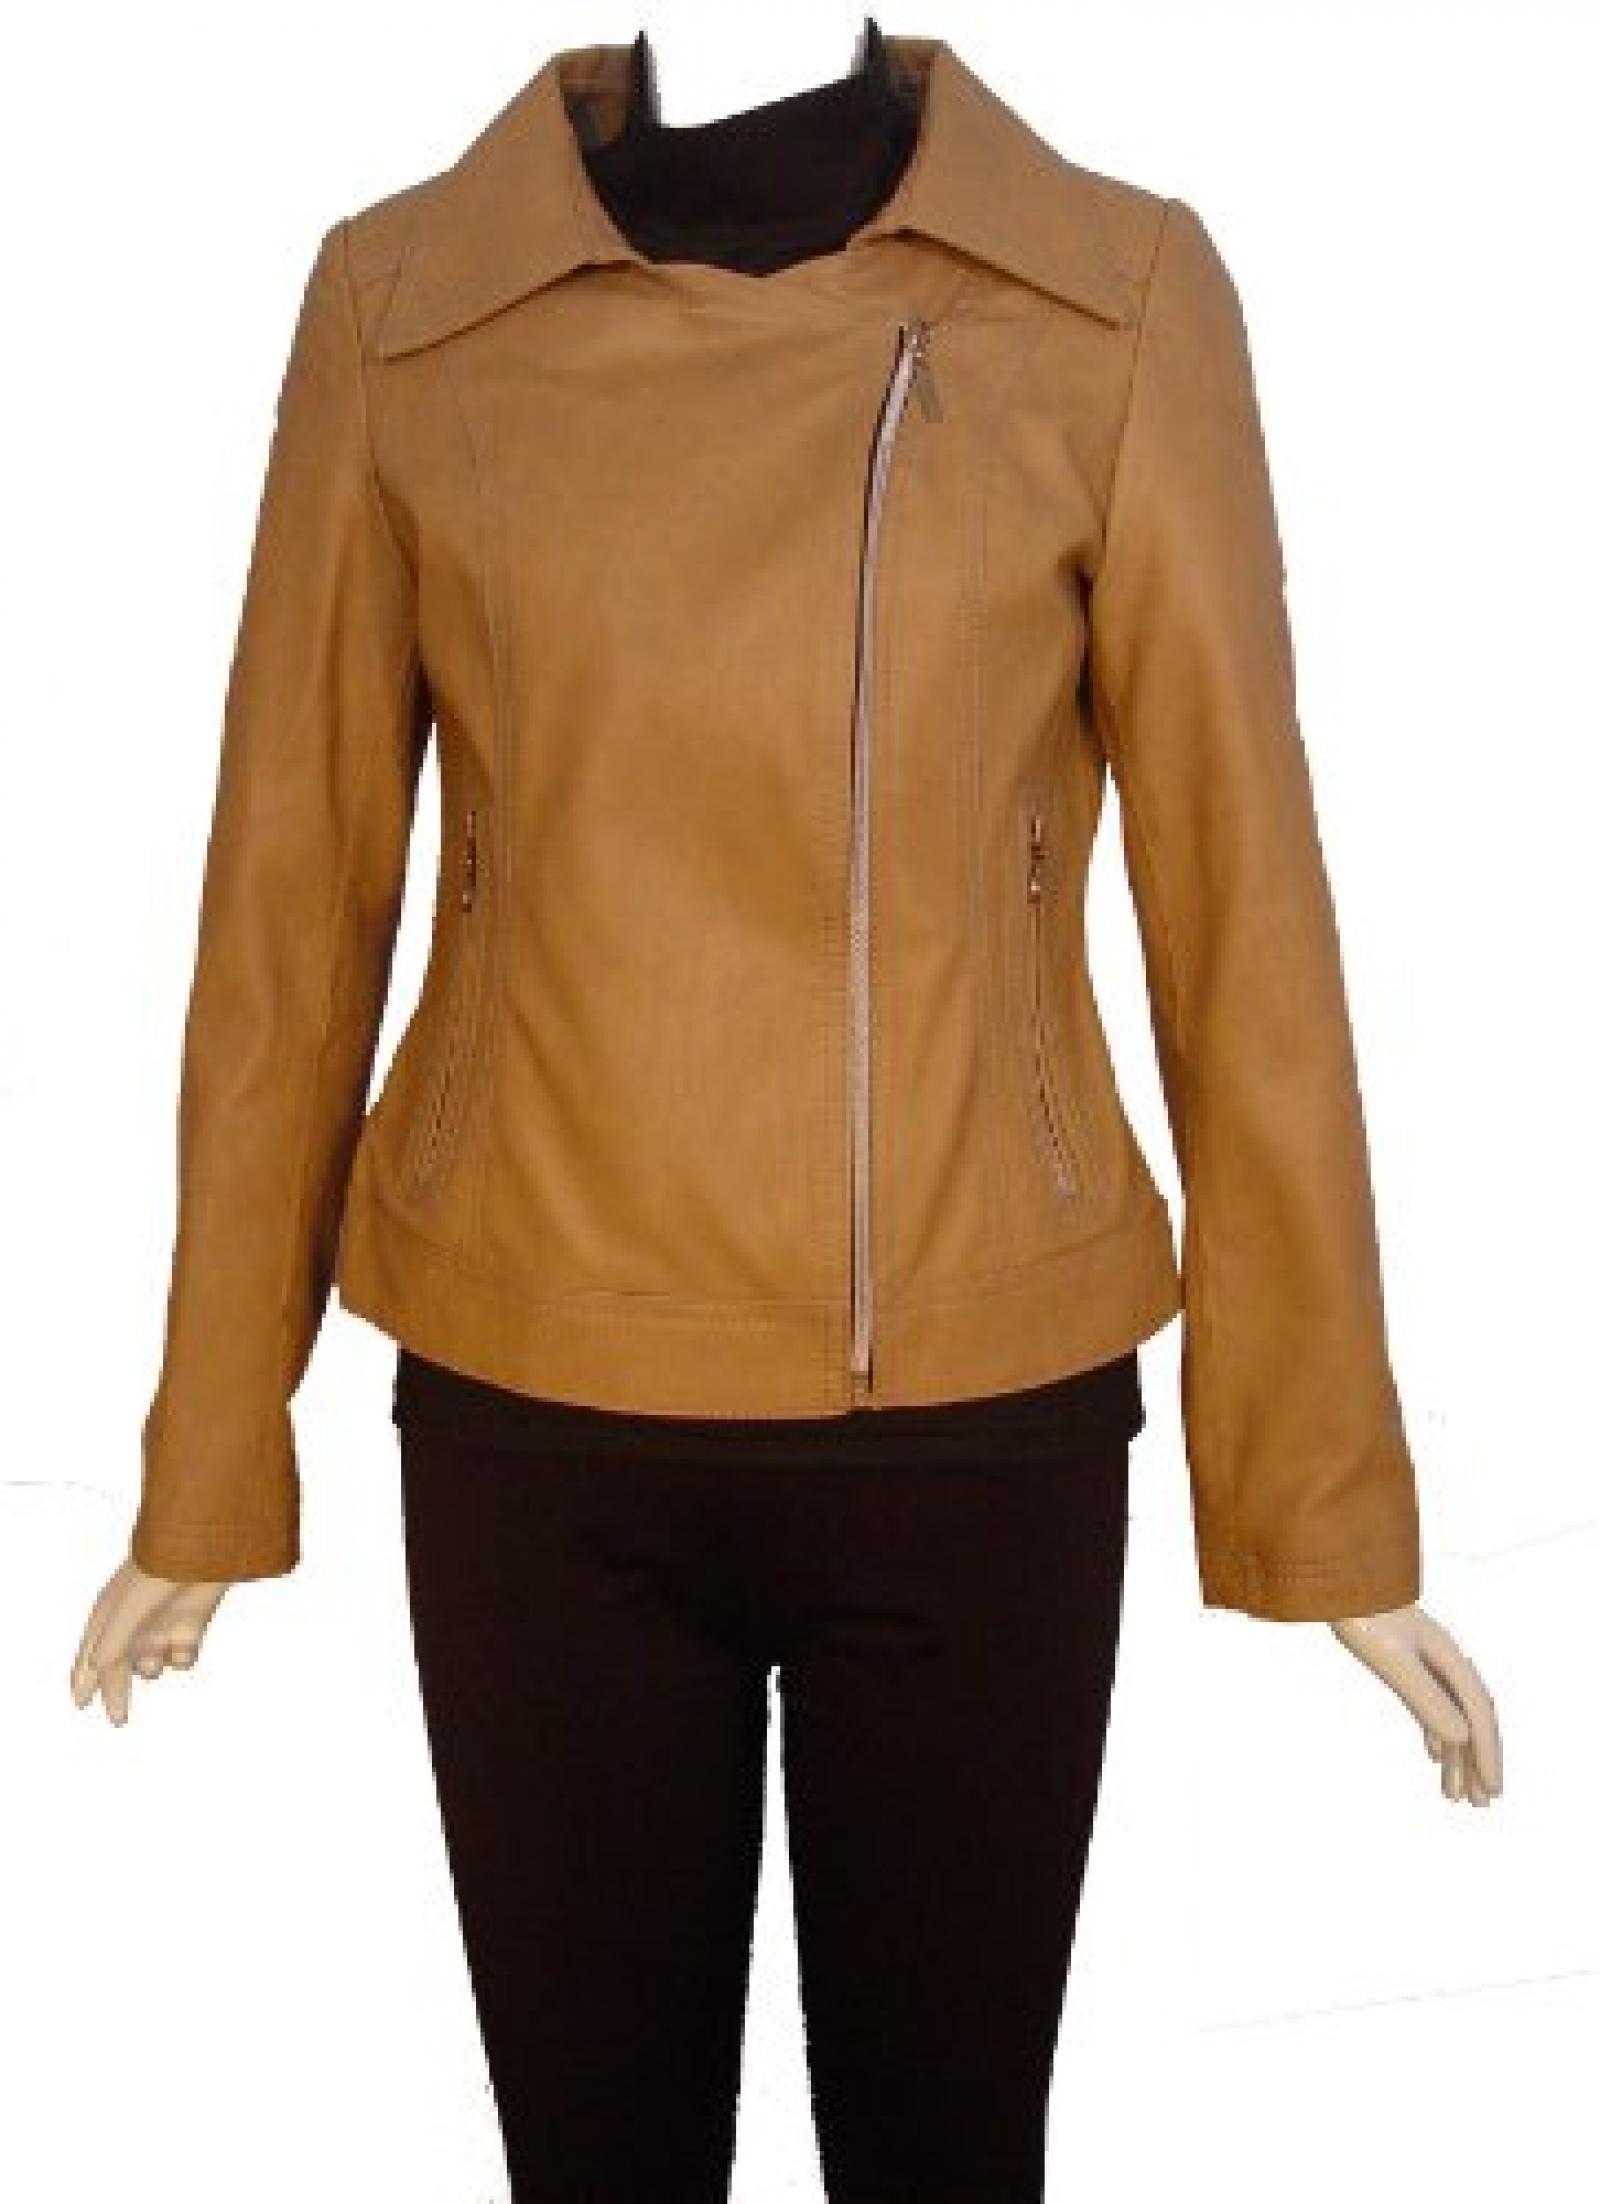 Nettailor FREE tailoring Women PETITE SZ 4094 Leather Moto Jacket